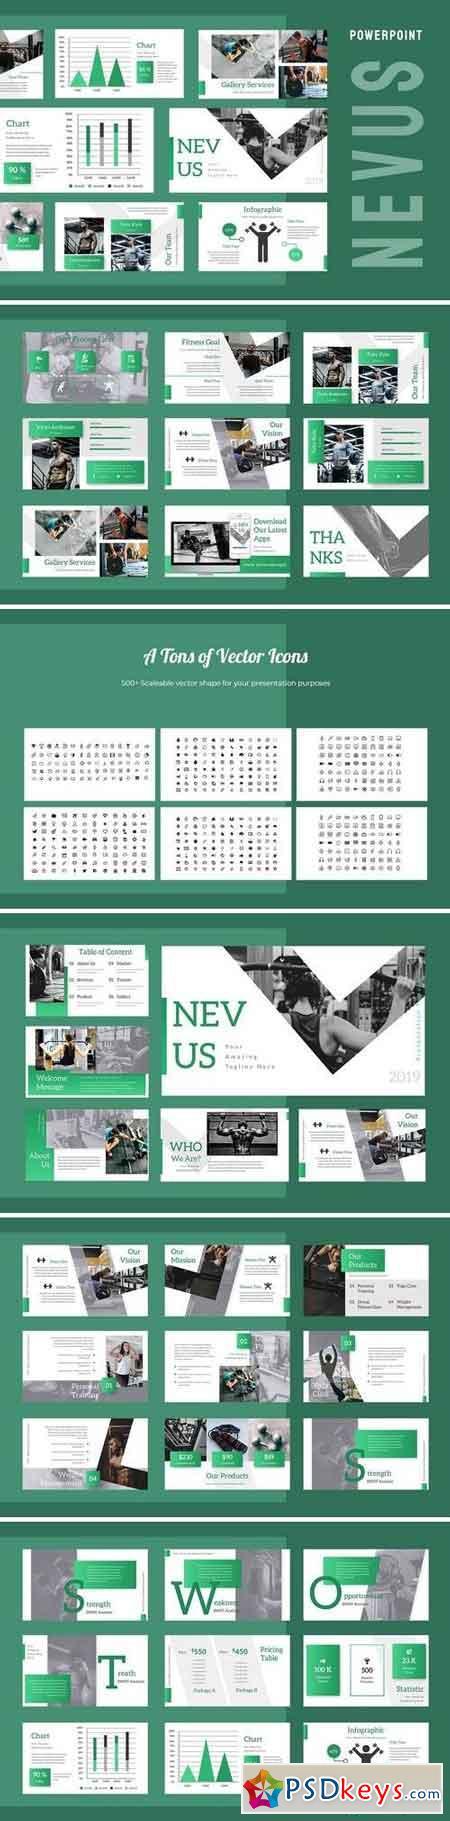 Nevus Gym - Powerpoint, Keynote, Google Sliders Templates